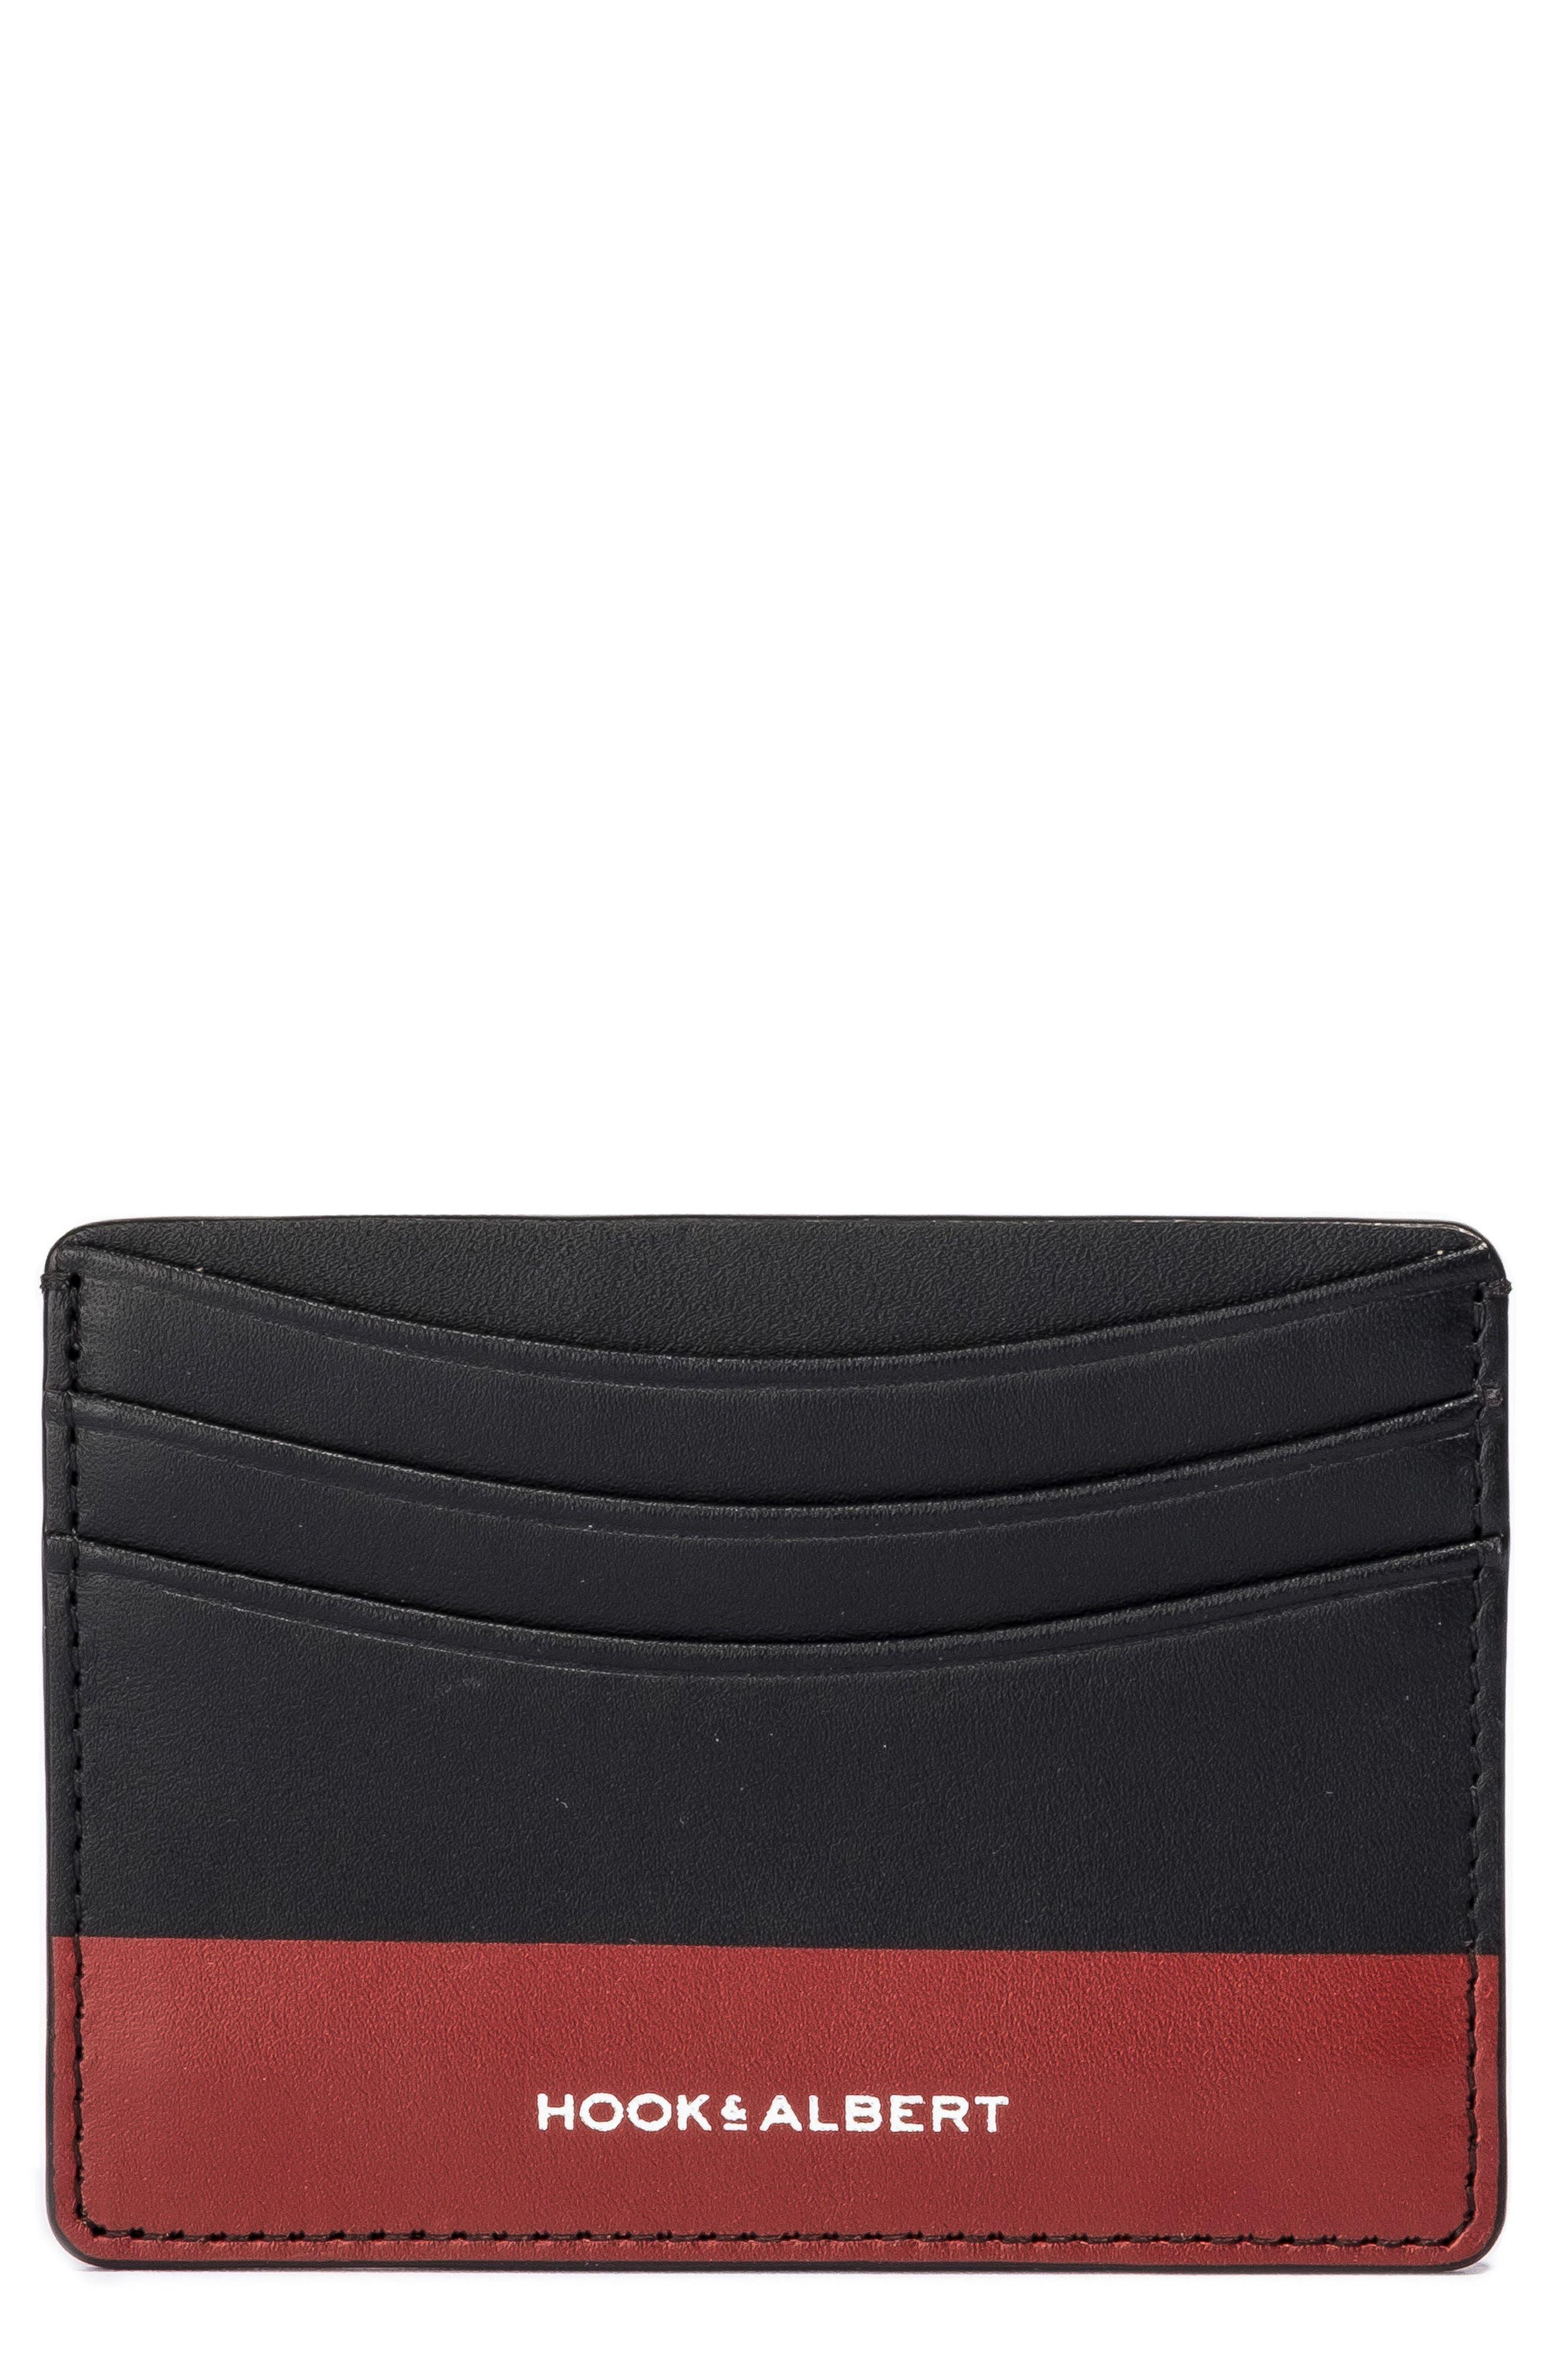 hook + ALBERT Leather Card Case